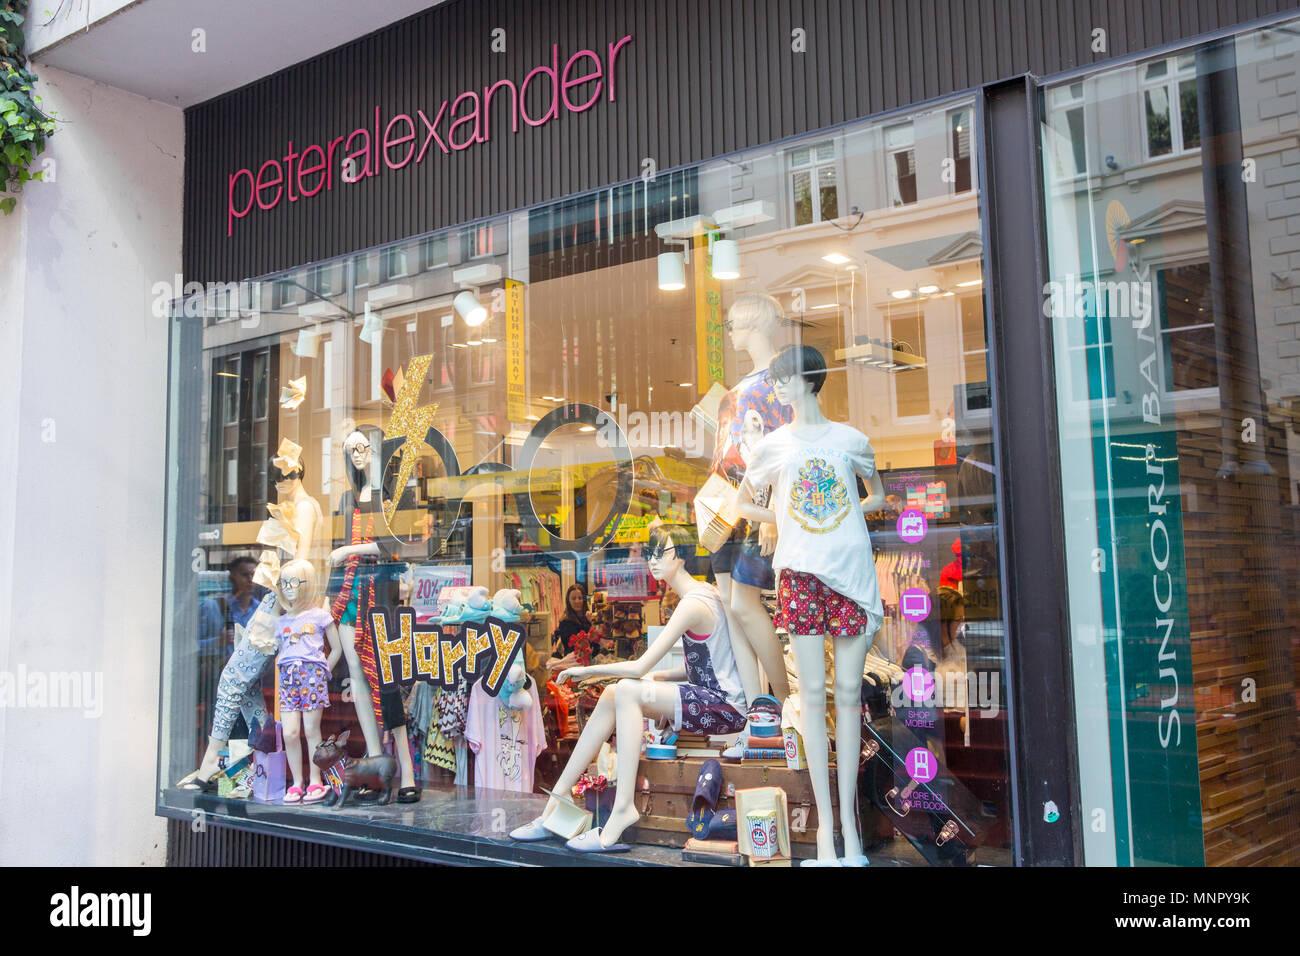 913c26d402b Peter Alexander sleepwear nightwear store in George street Sydney ...